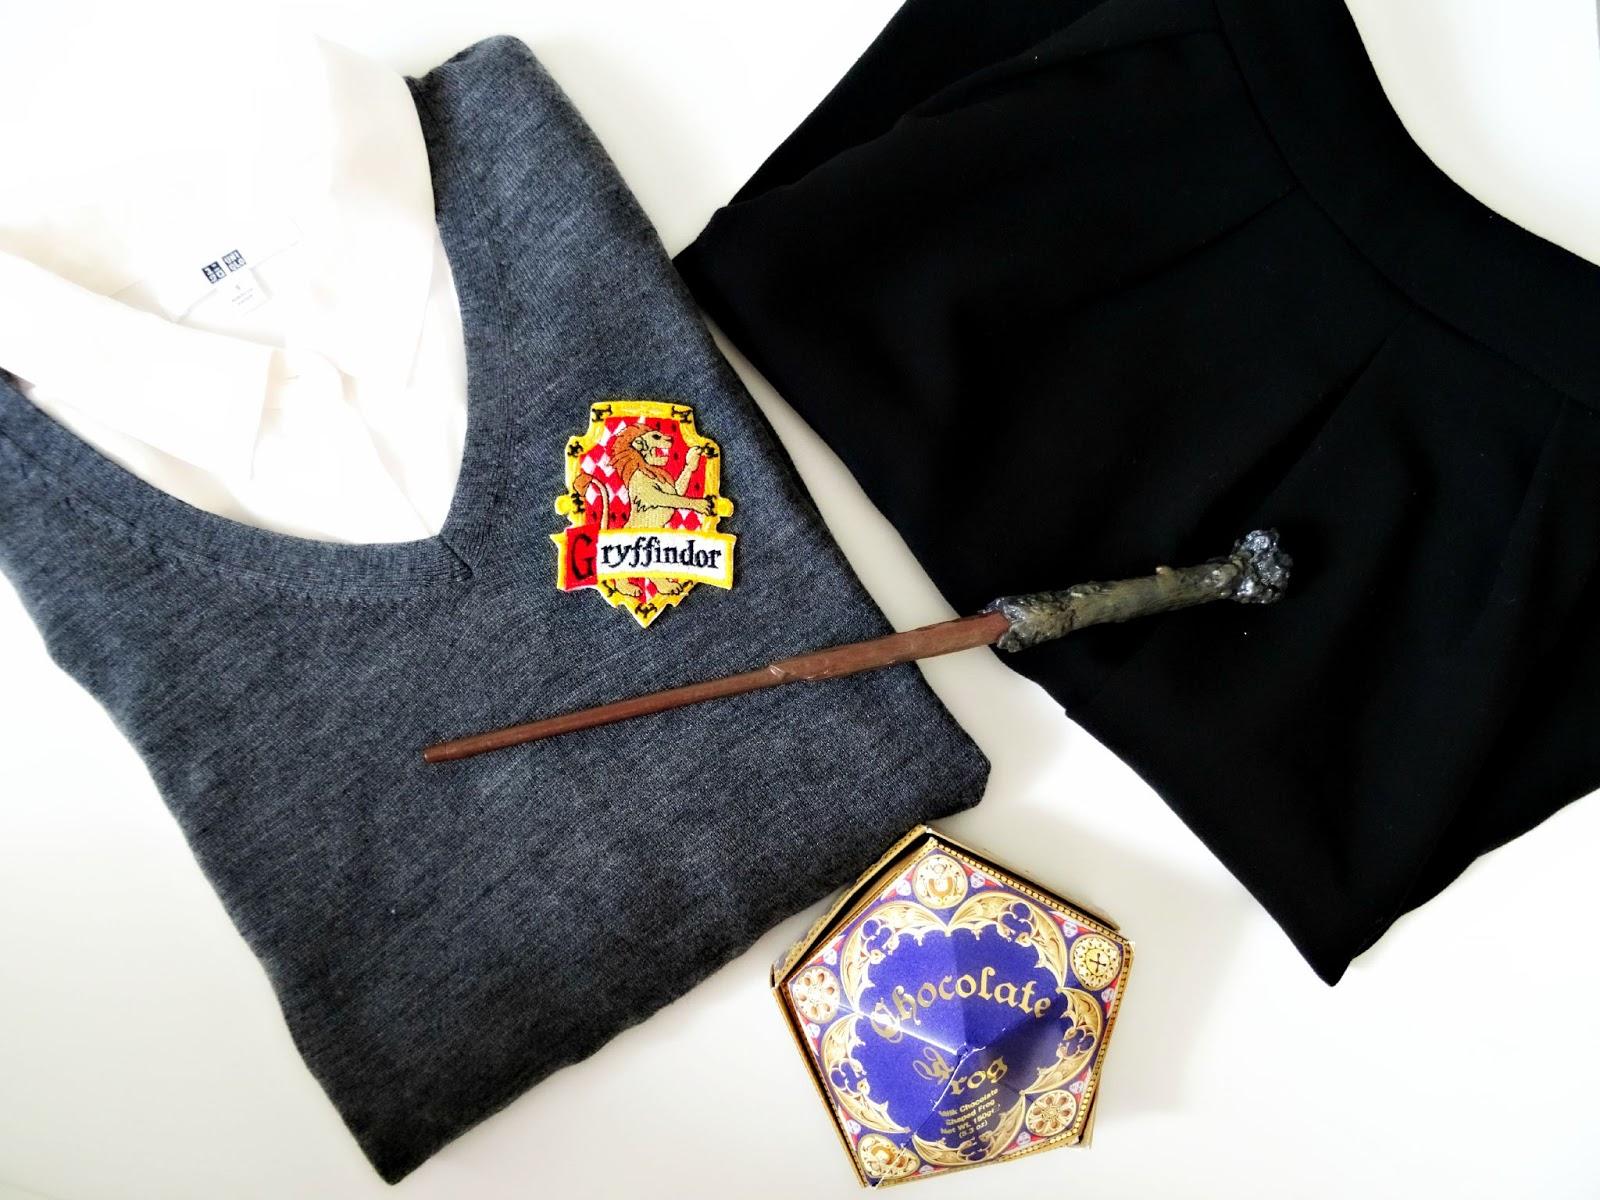 Harry Potter fashion post